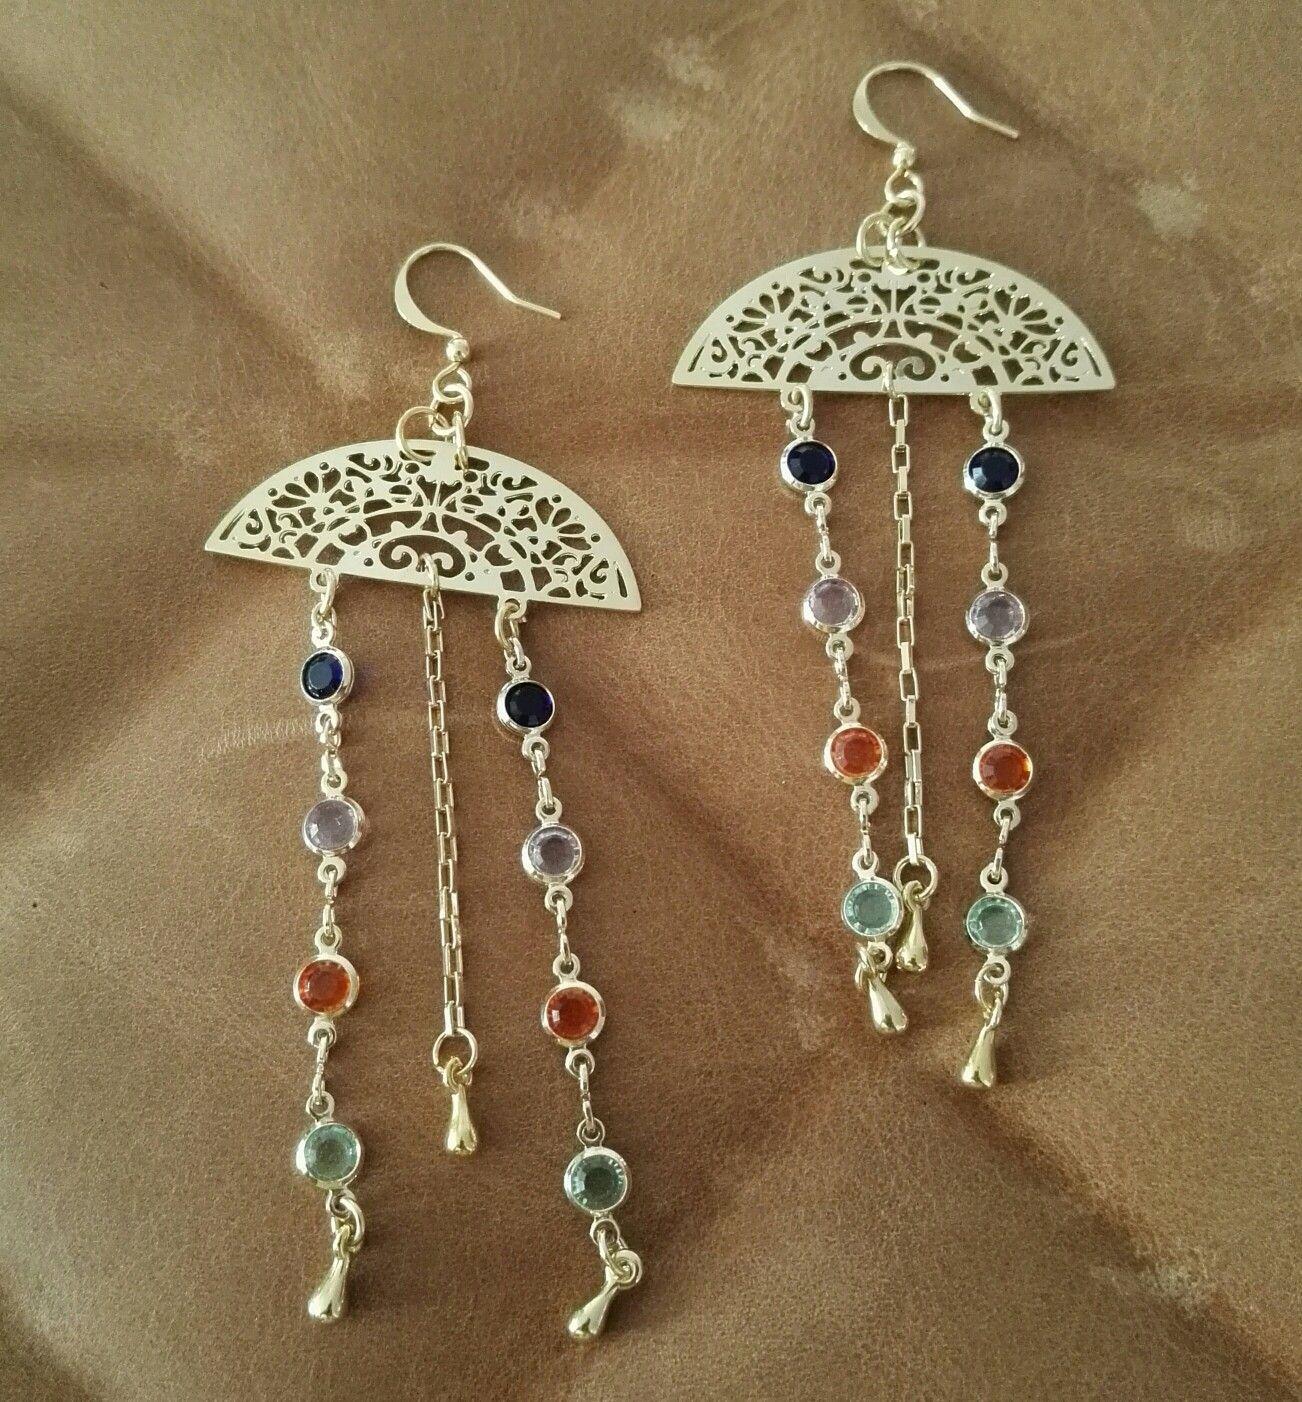 dc9b011d08bf Aretes medusa. Cristales y piedras semipreciosas.  sortilegio col.   earrings  maxiaretes